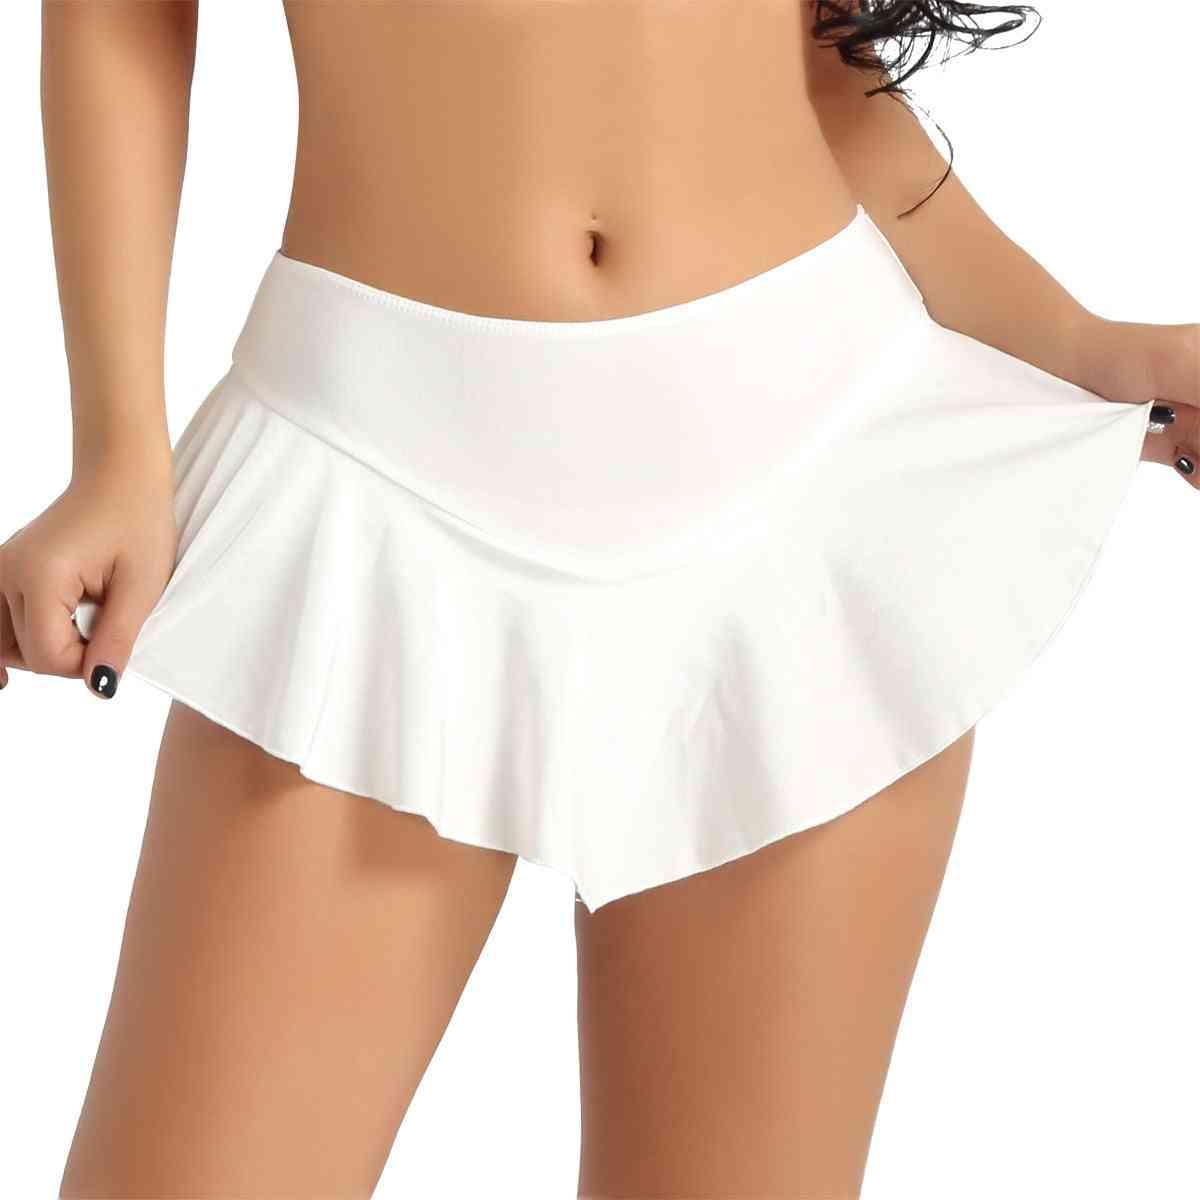 Women Stretchy Tennis Skirt With Shorts Figure Skirting- Mini Dance Short Skirts